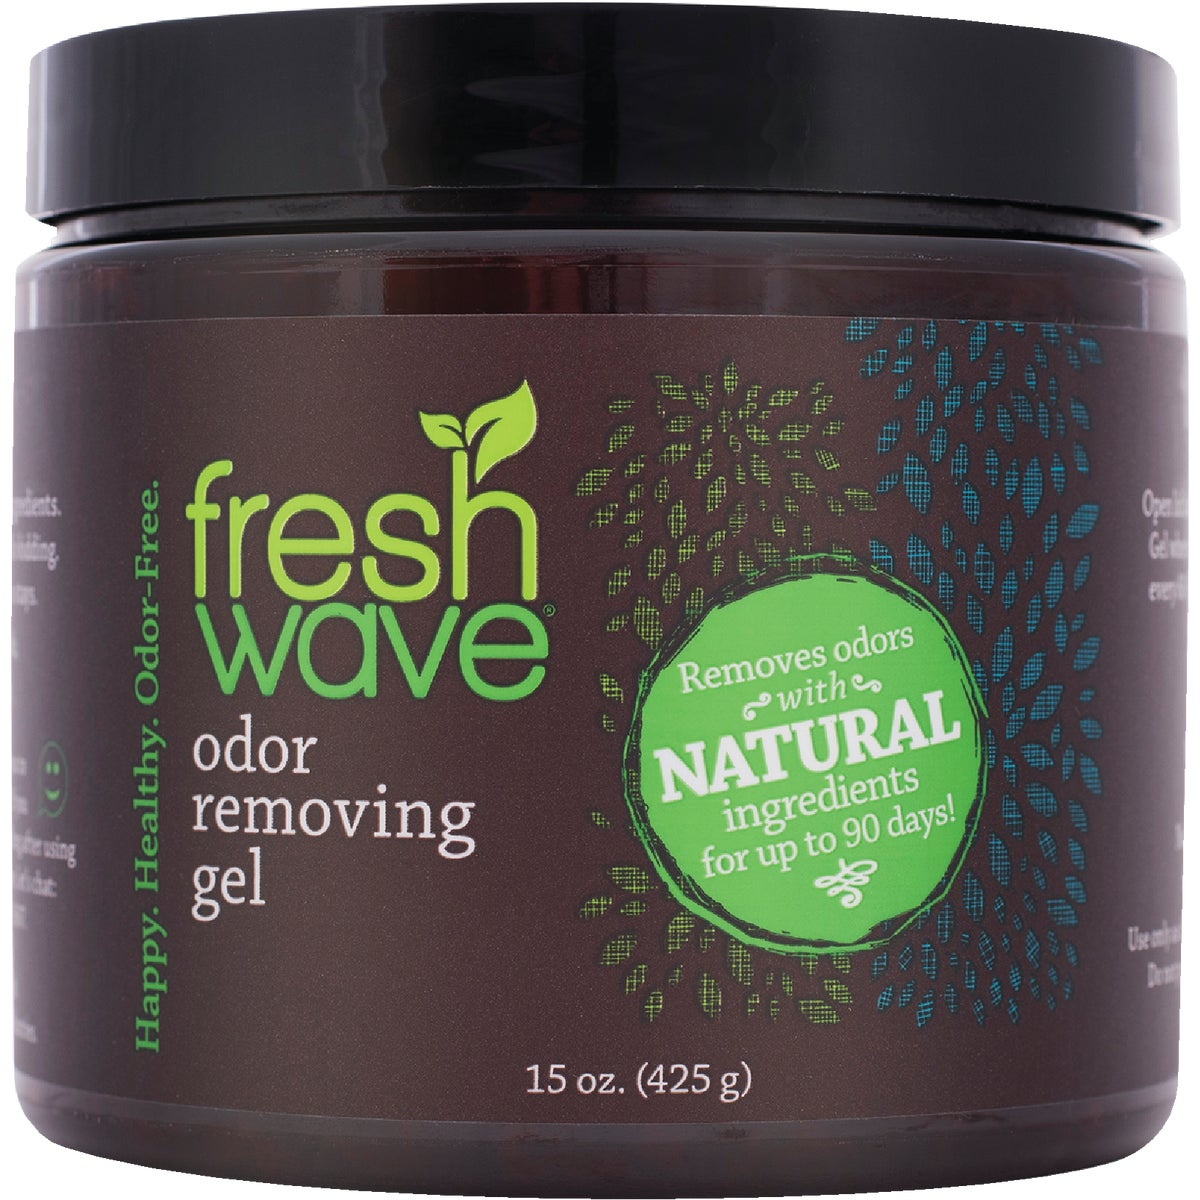 Fresh Wave Crystal Gel Air Freshener